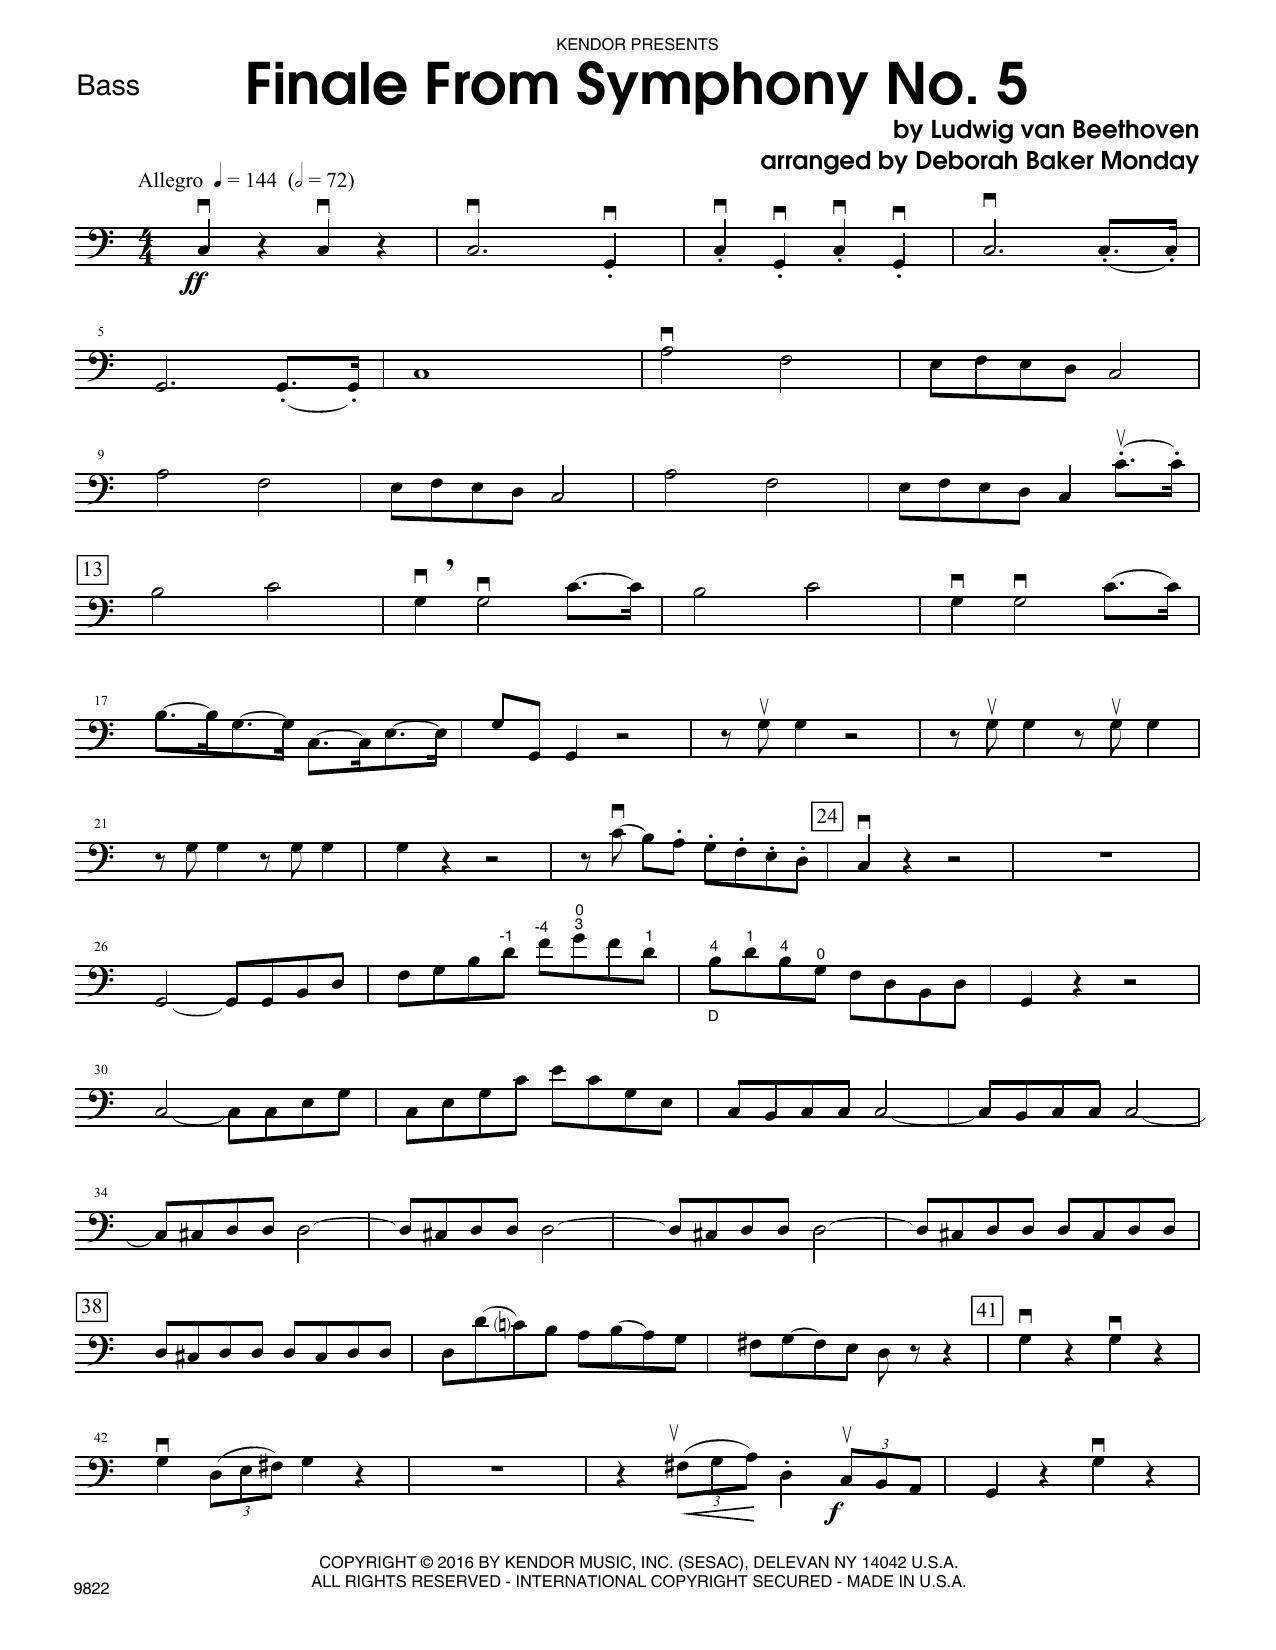 Finale from Symphony No. 5 - Bass Sheet Music